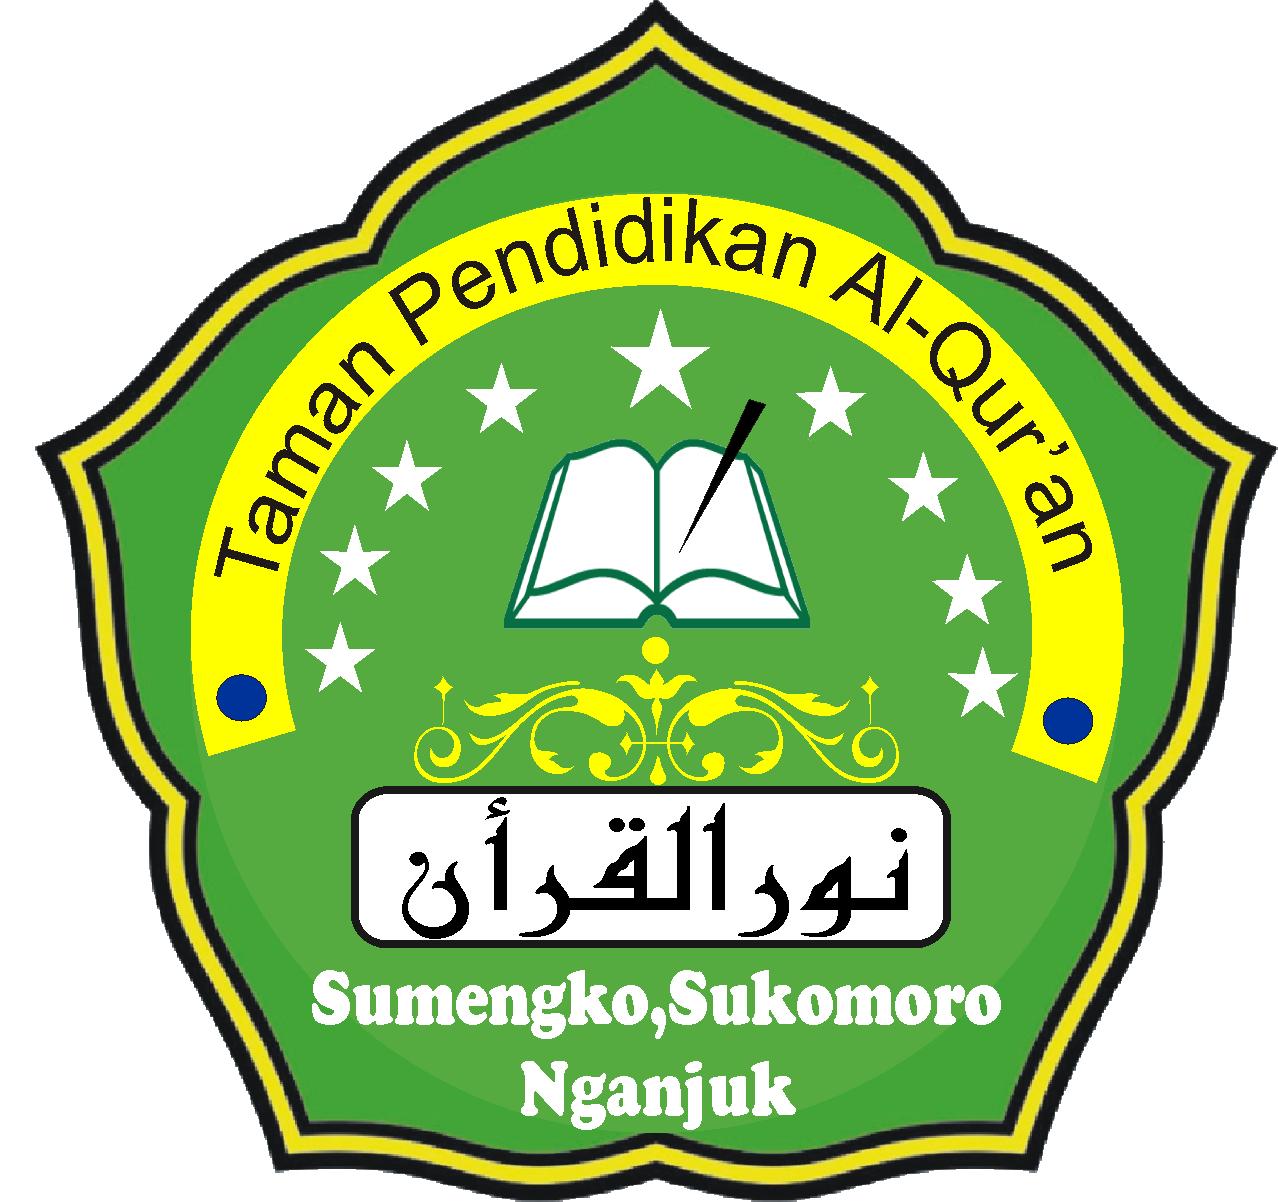 Konsep Jasa Desain Grafis: 43+ Konsep Gambar Logo Tpq, Gambar Logo